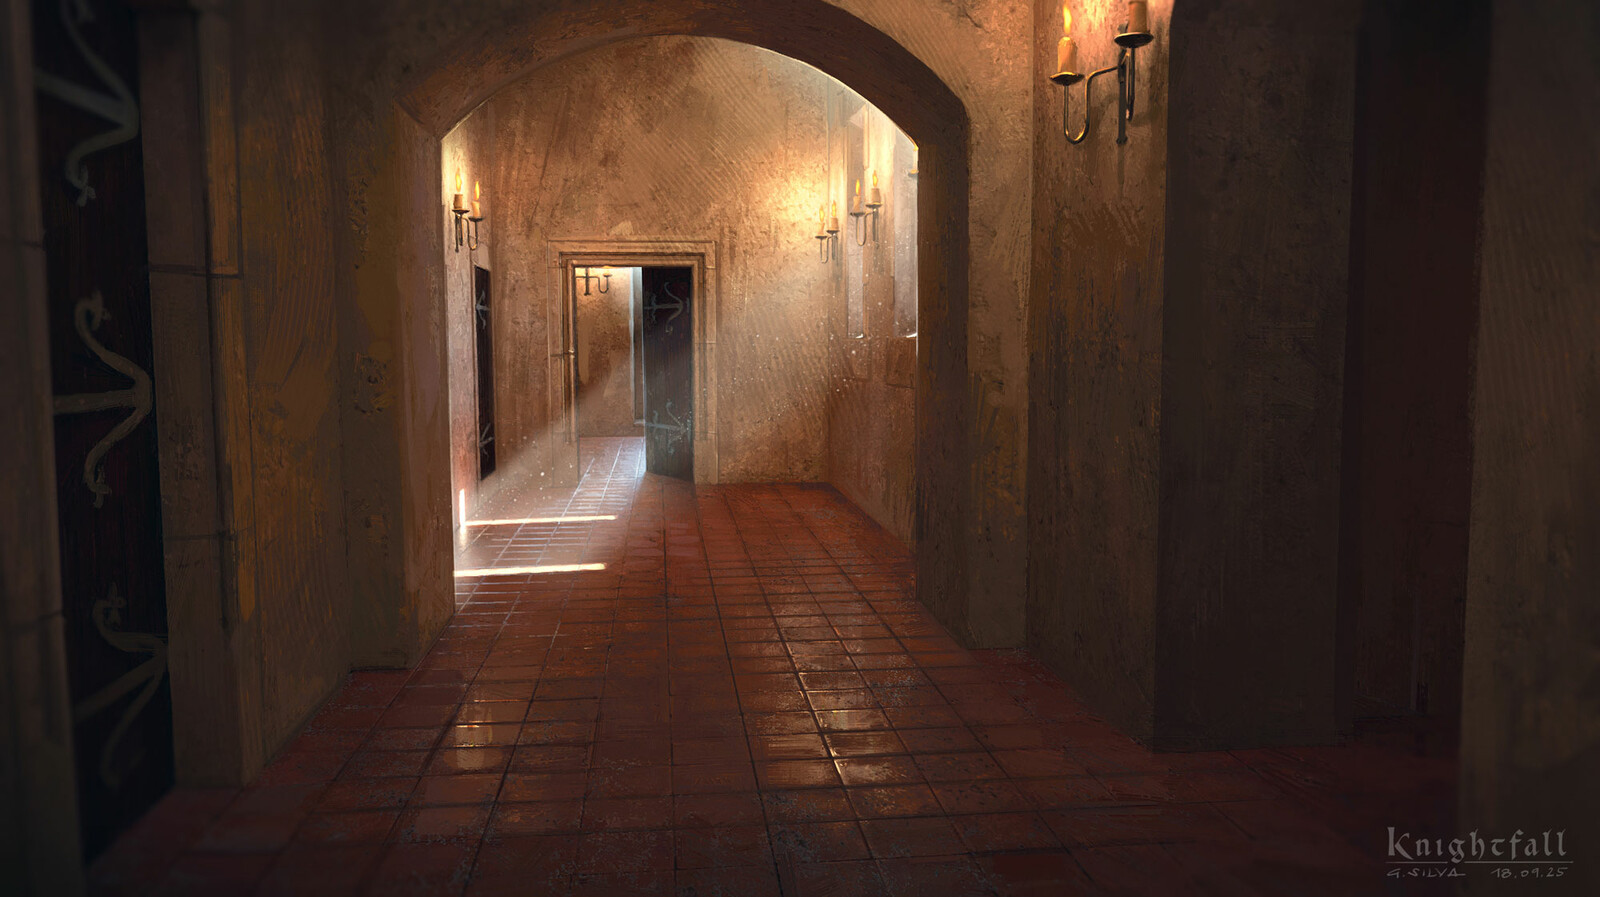 Convent's hallway